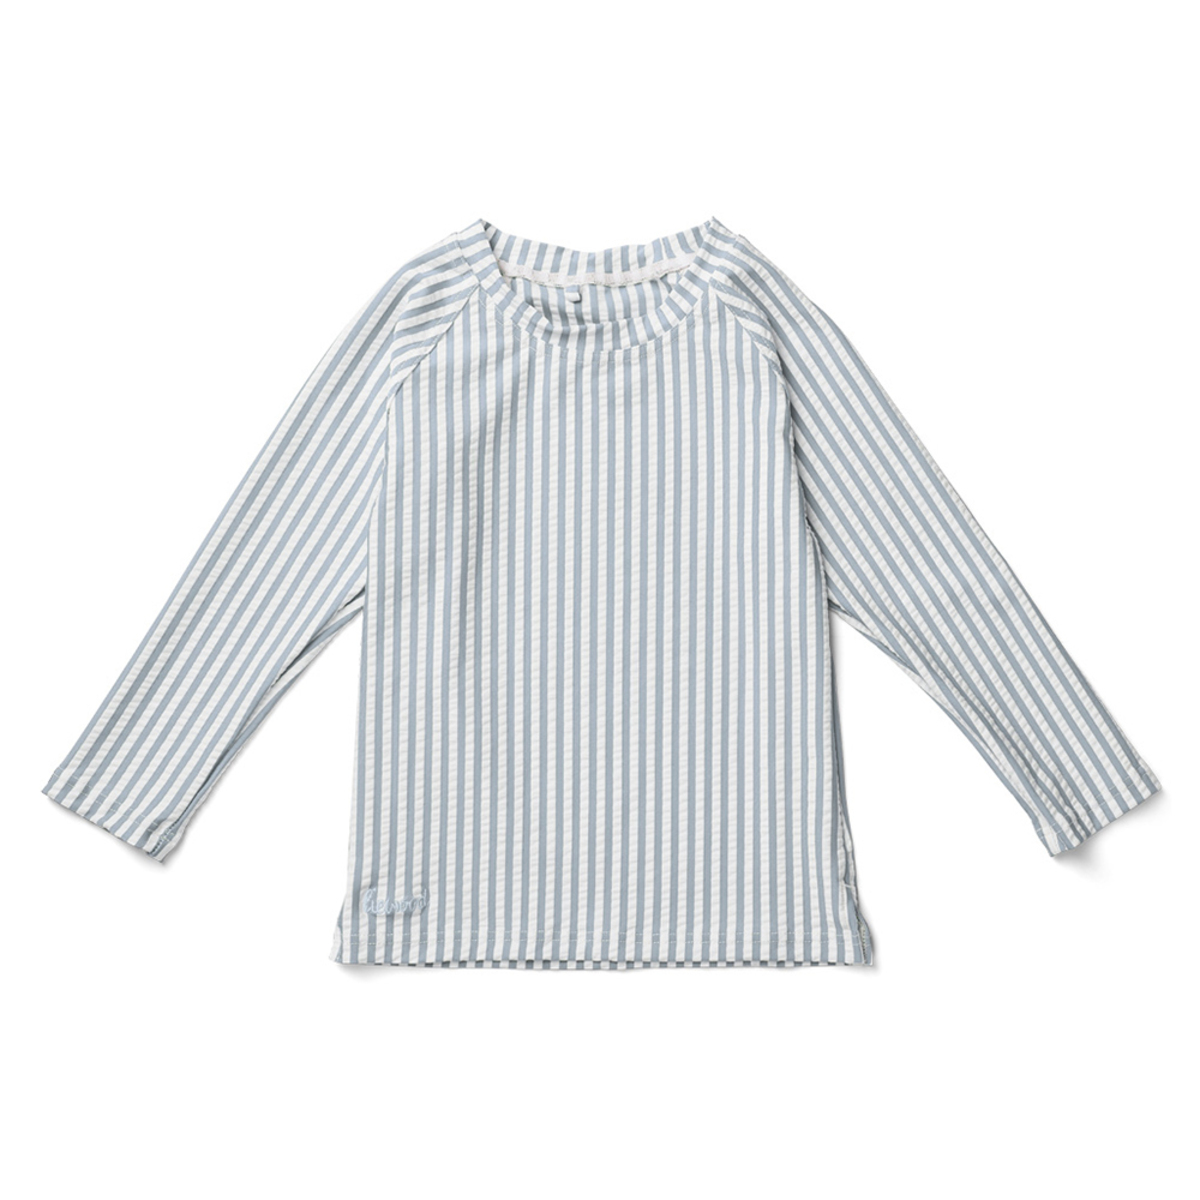 Accessoires bébé Tee-Shirt Noah Rayé Bleu et Blanc - 18/36 Mois Tee-Shirt Noah Rayé Bleu et Blanc - 18/36 Mois